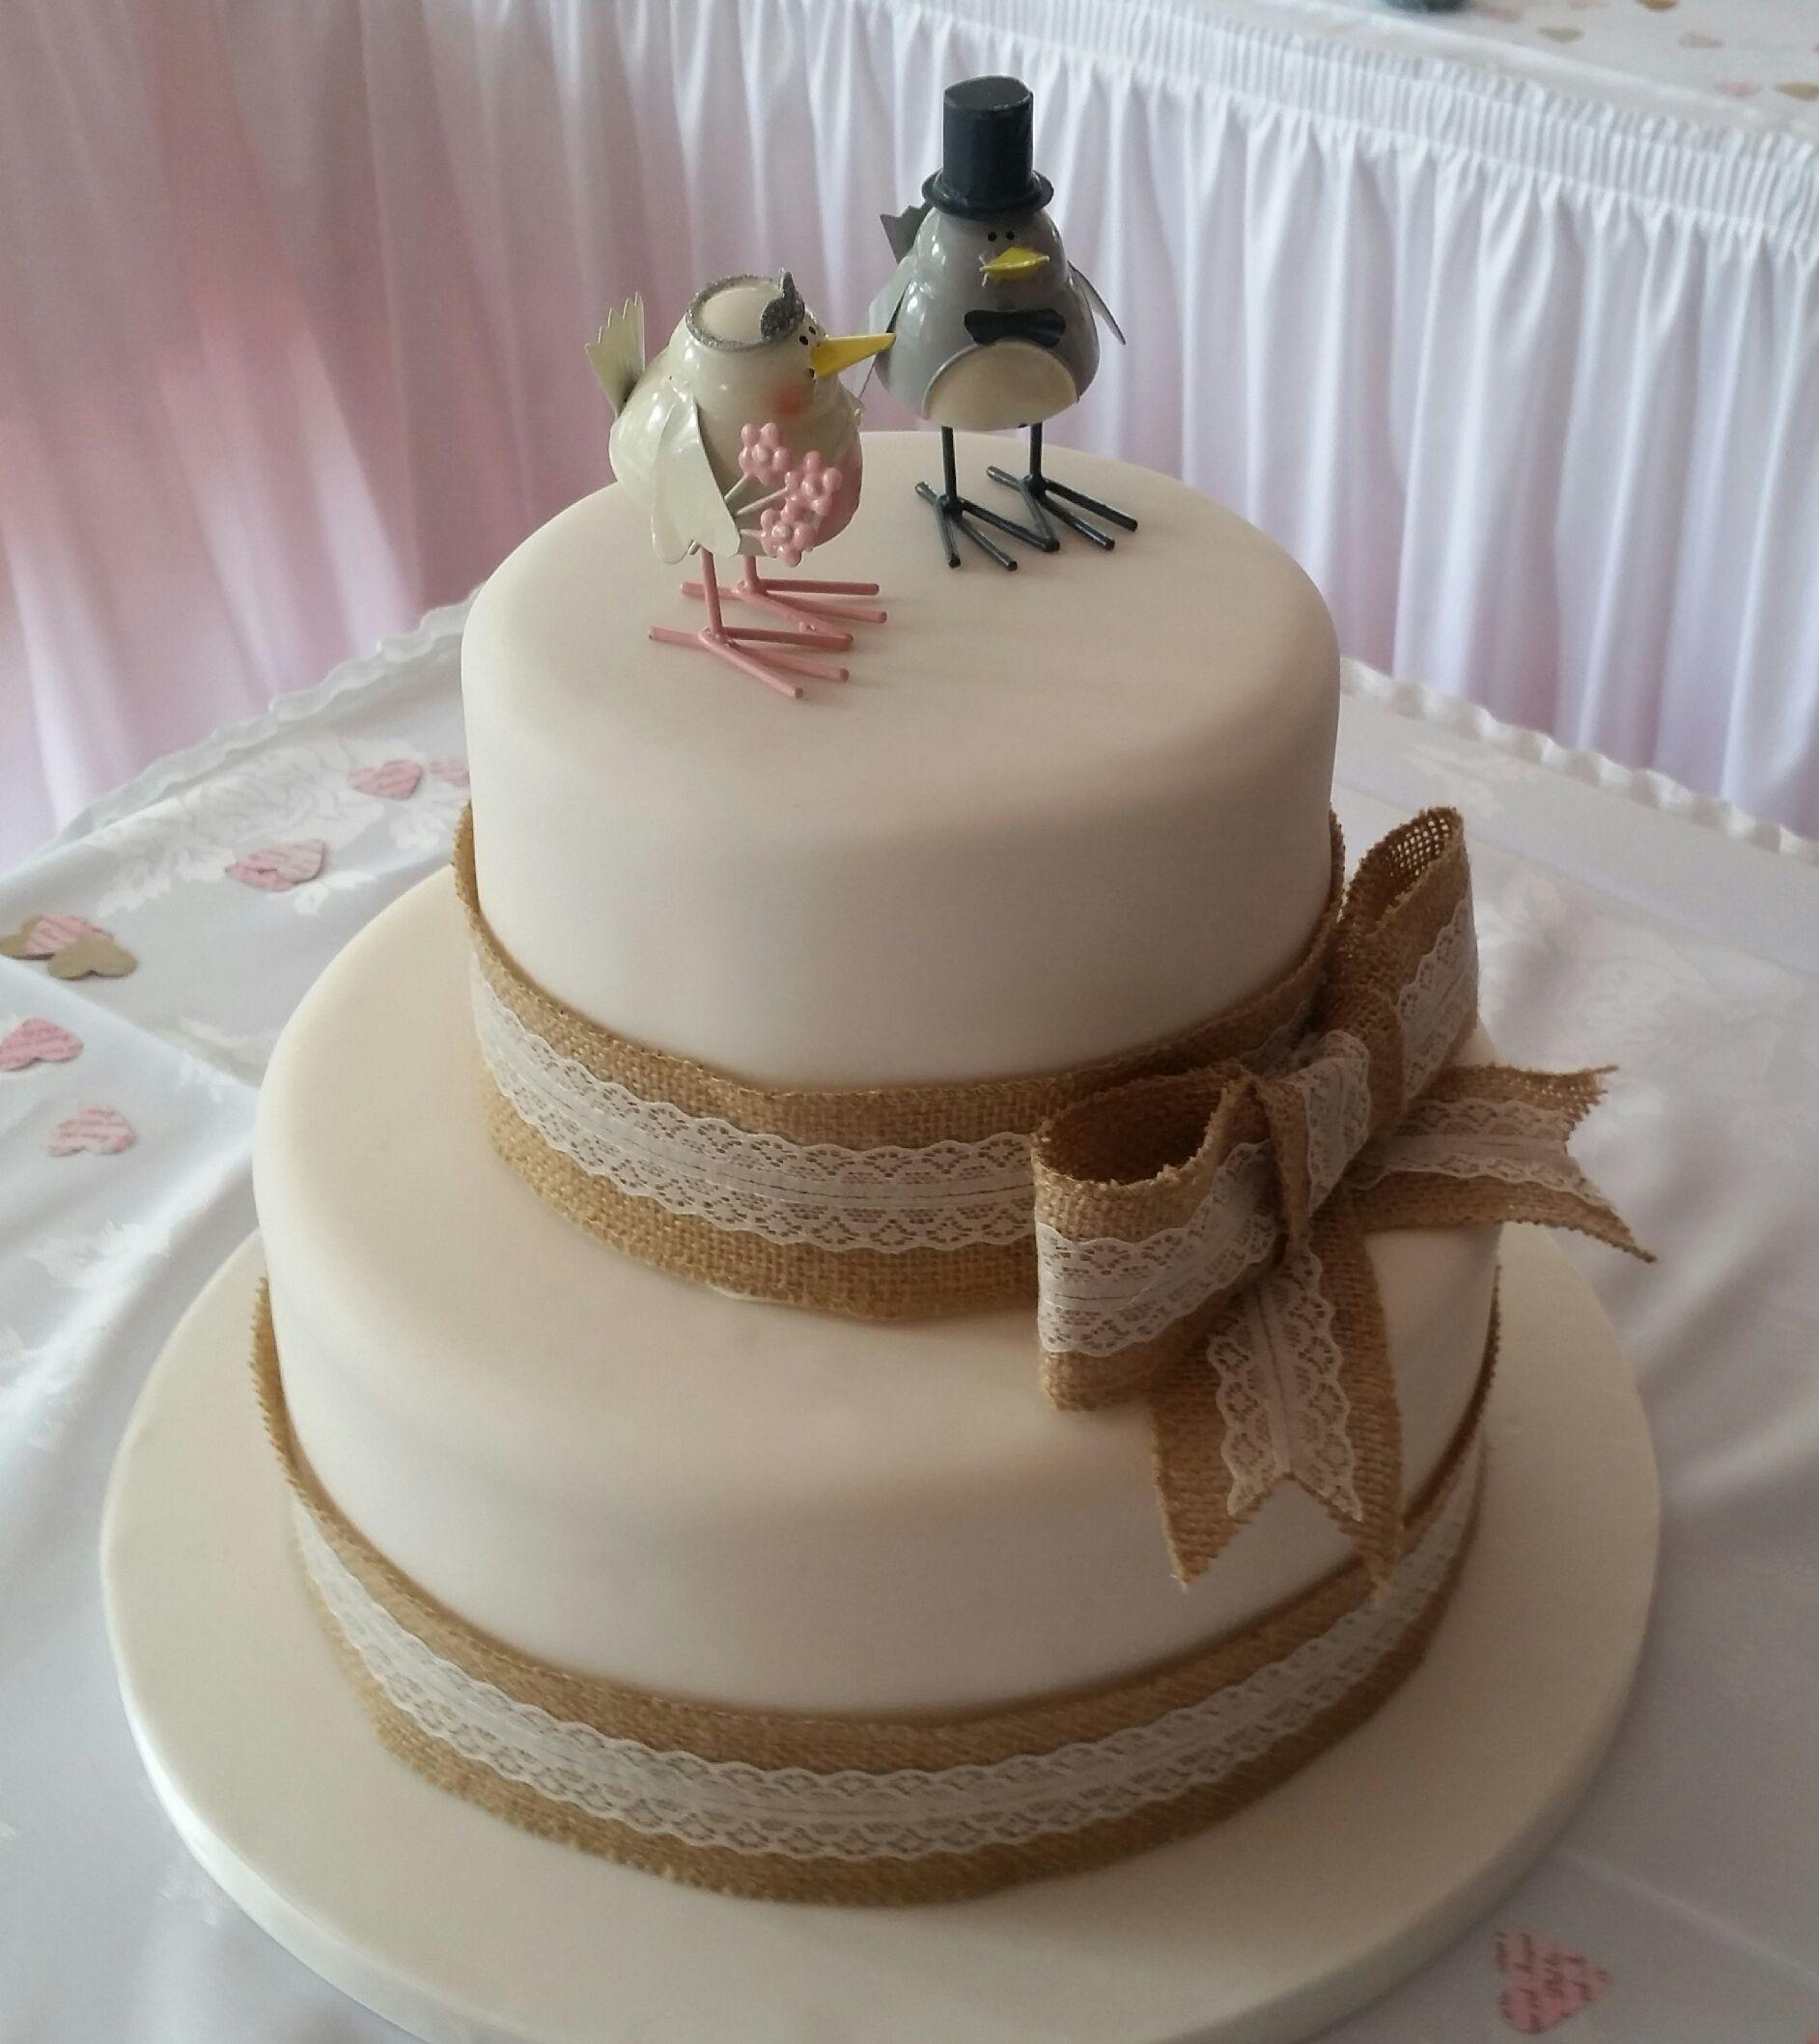 vegan wedding cakes houston